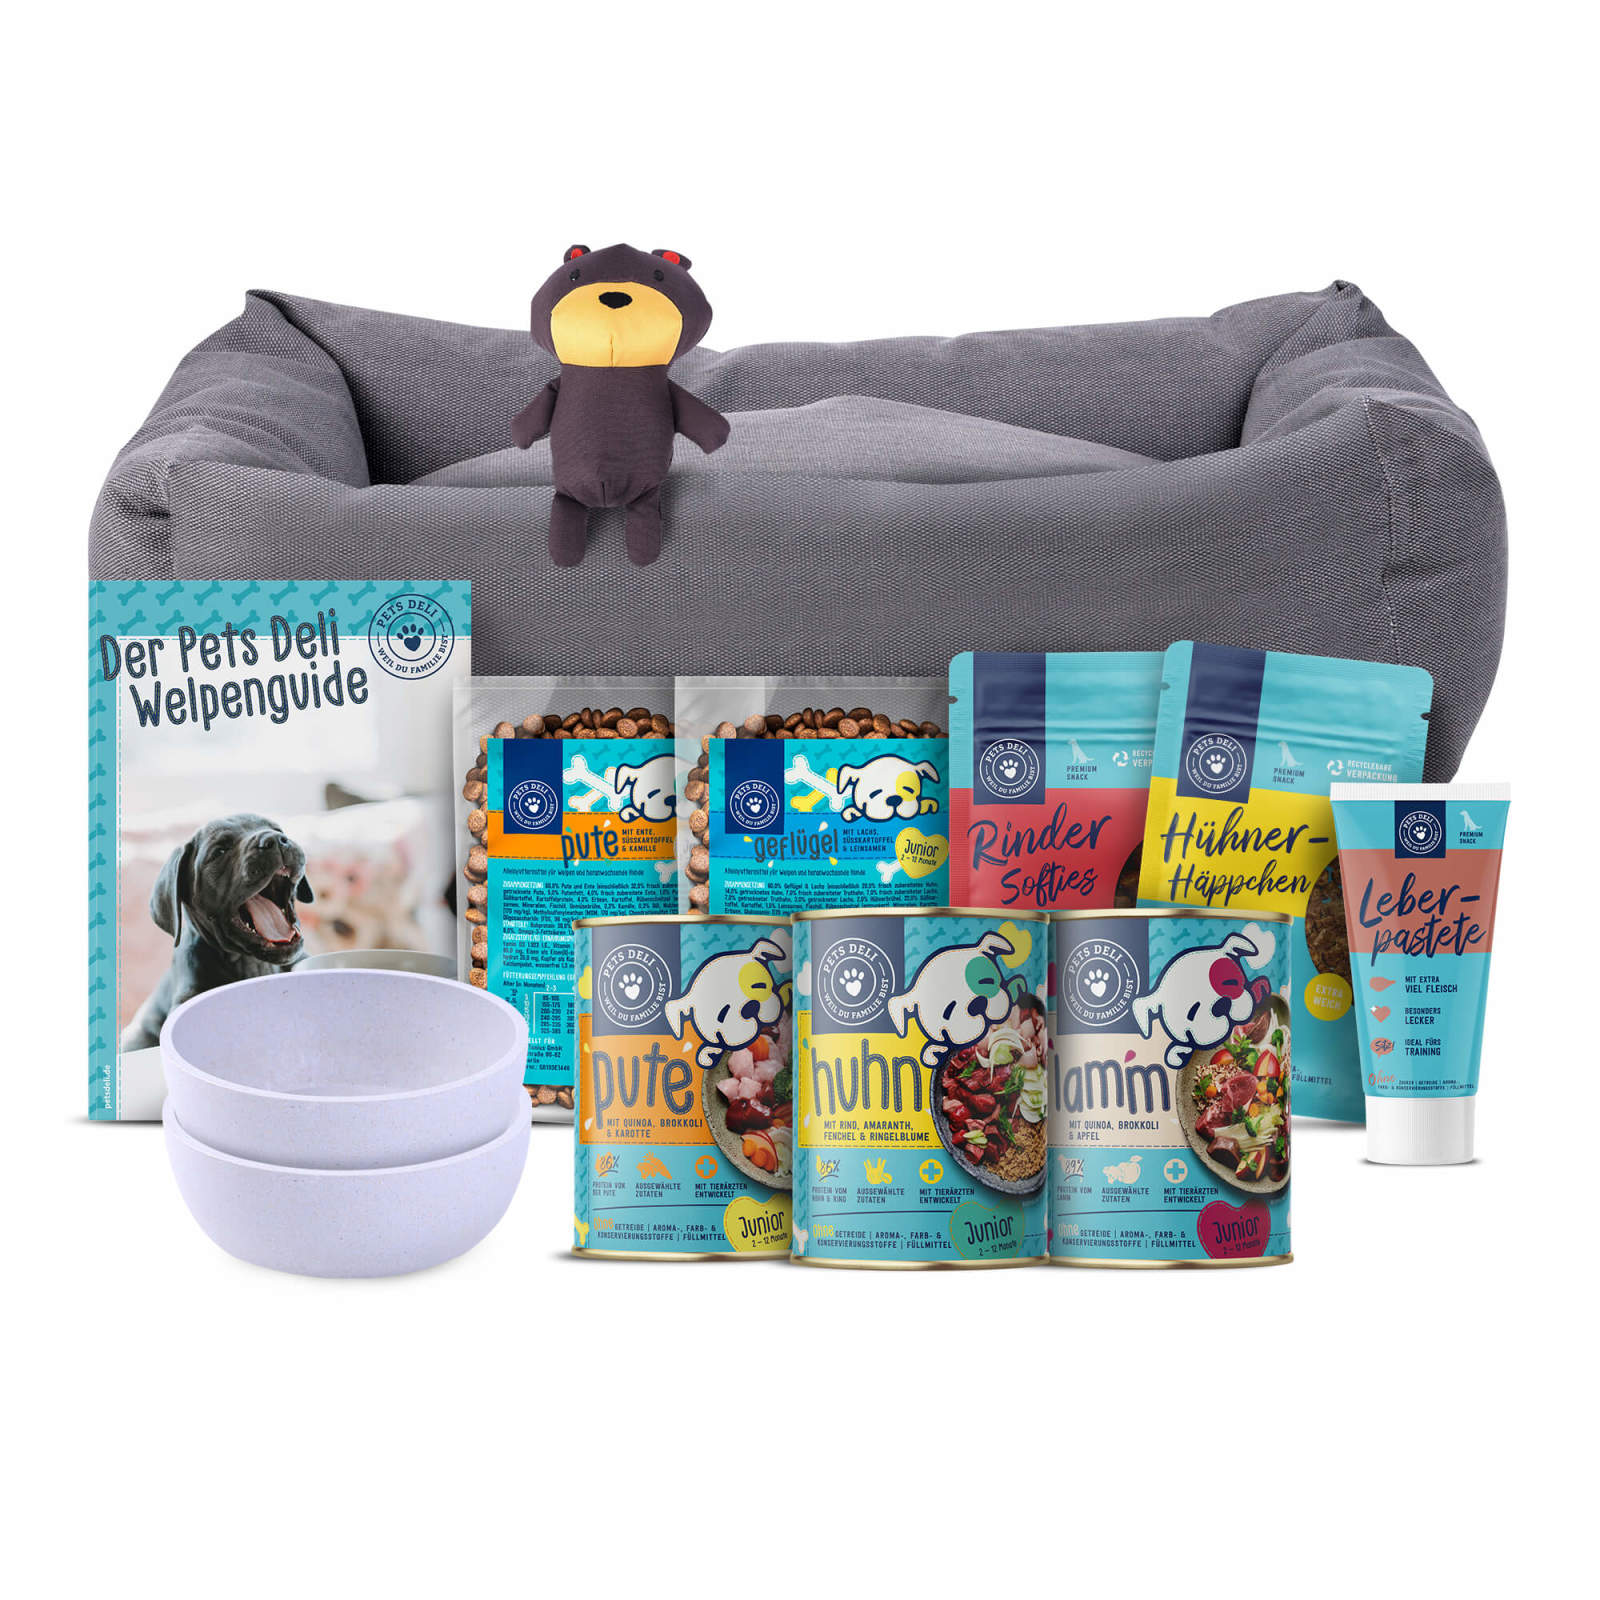 210515-puppy-kits-dog-home-m-01